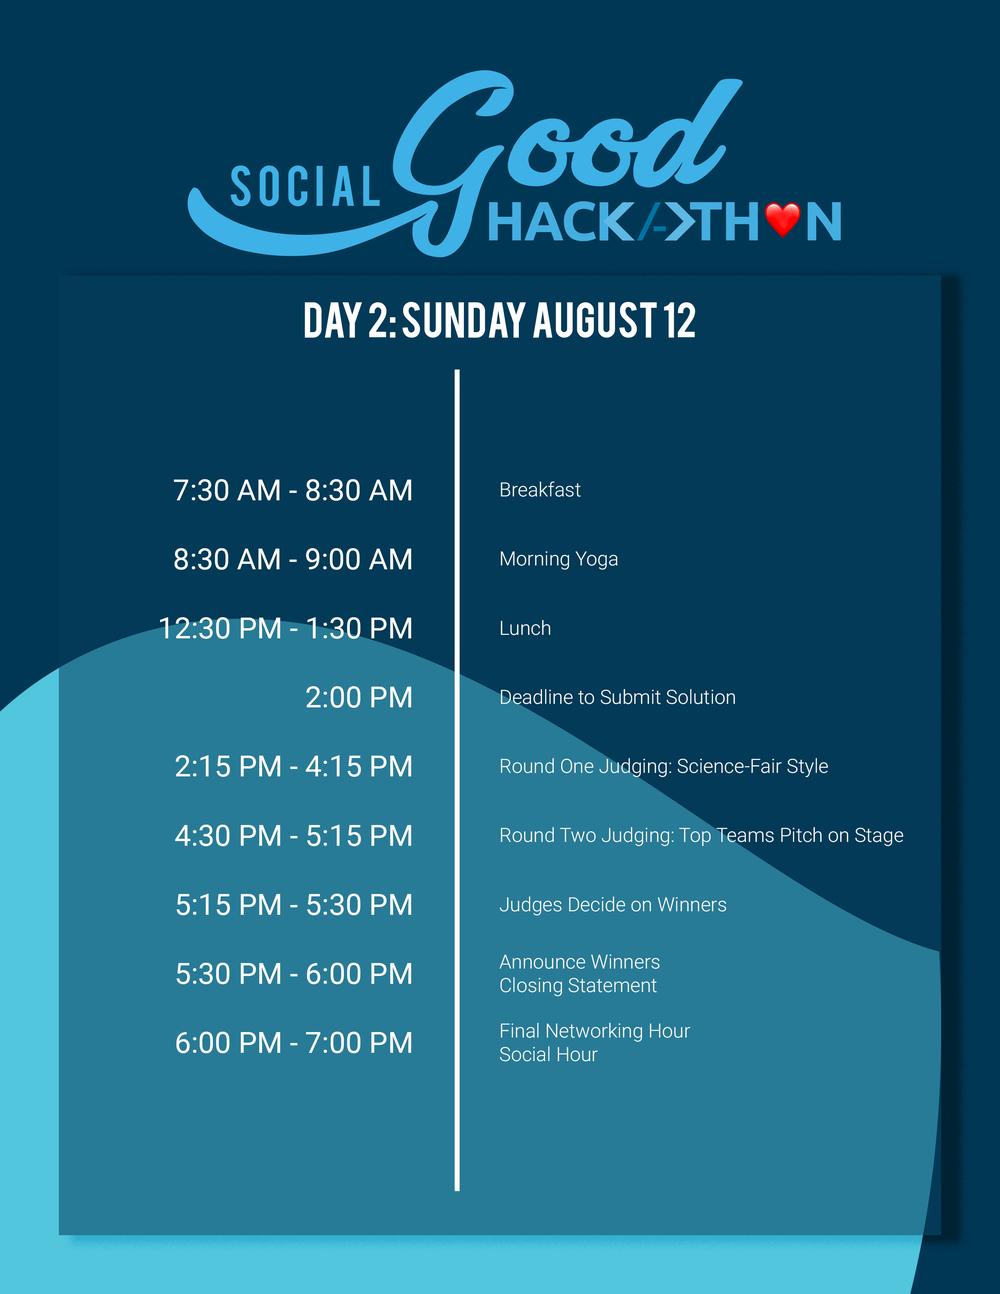 Social Good Hackathon Agenda-2.png